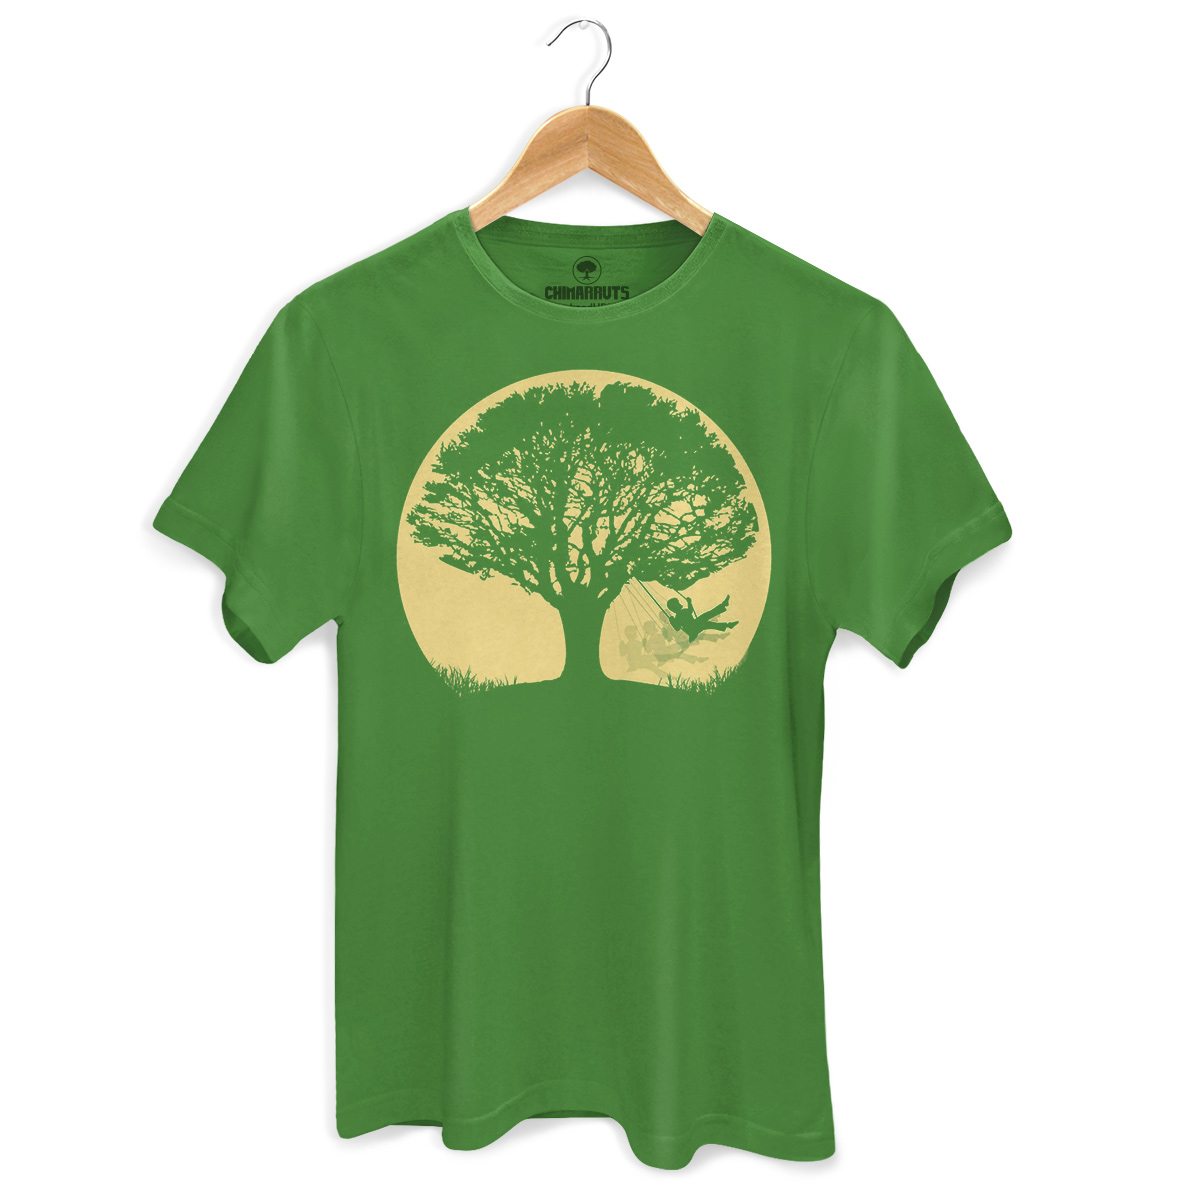 Camiseta Masculina Chimarruts Sinto a Liberdade